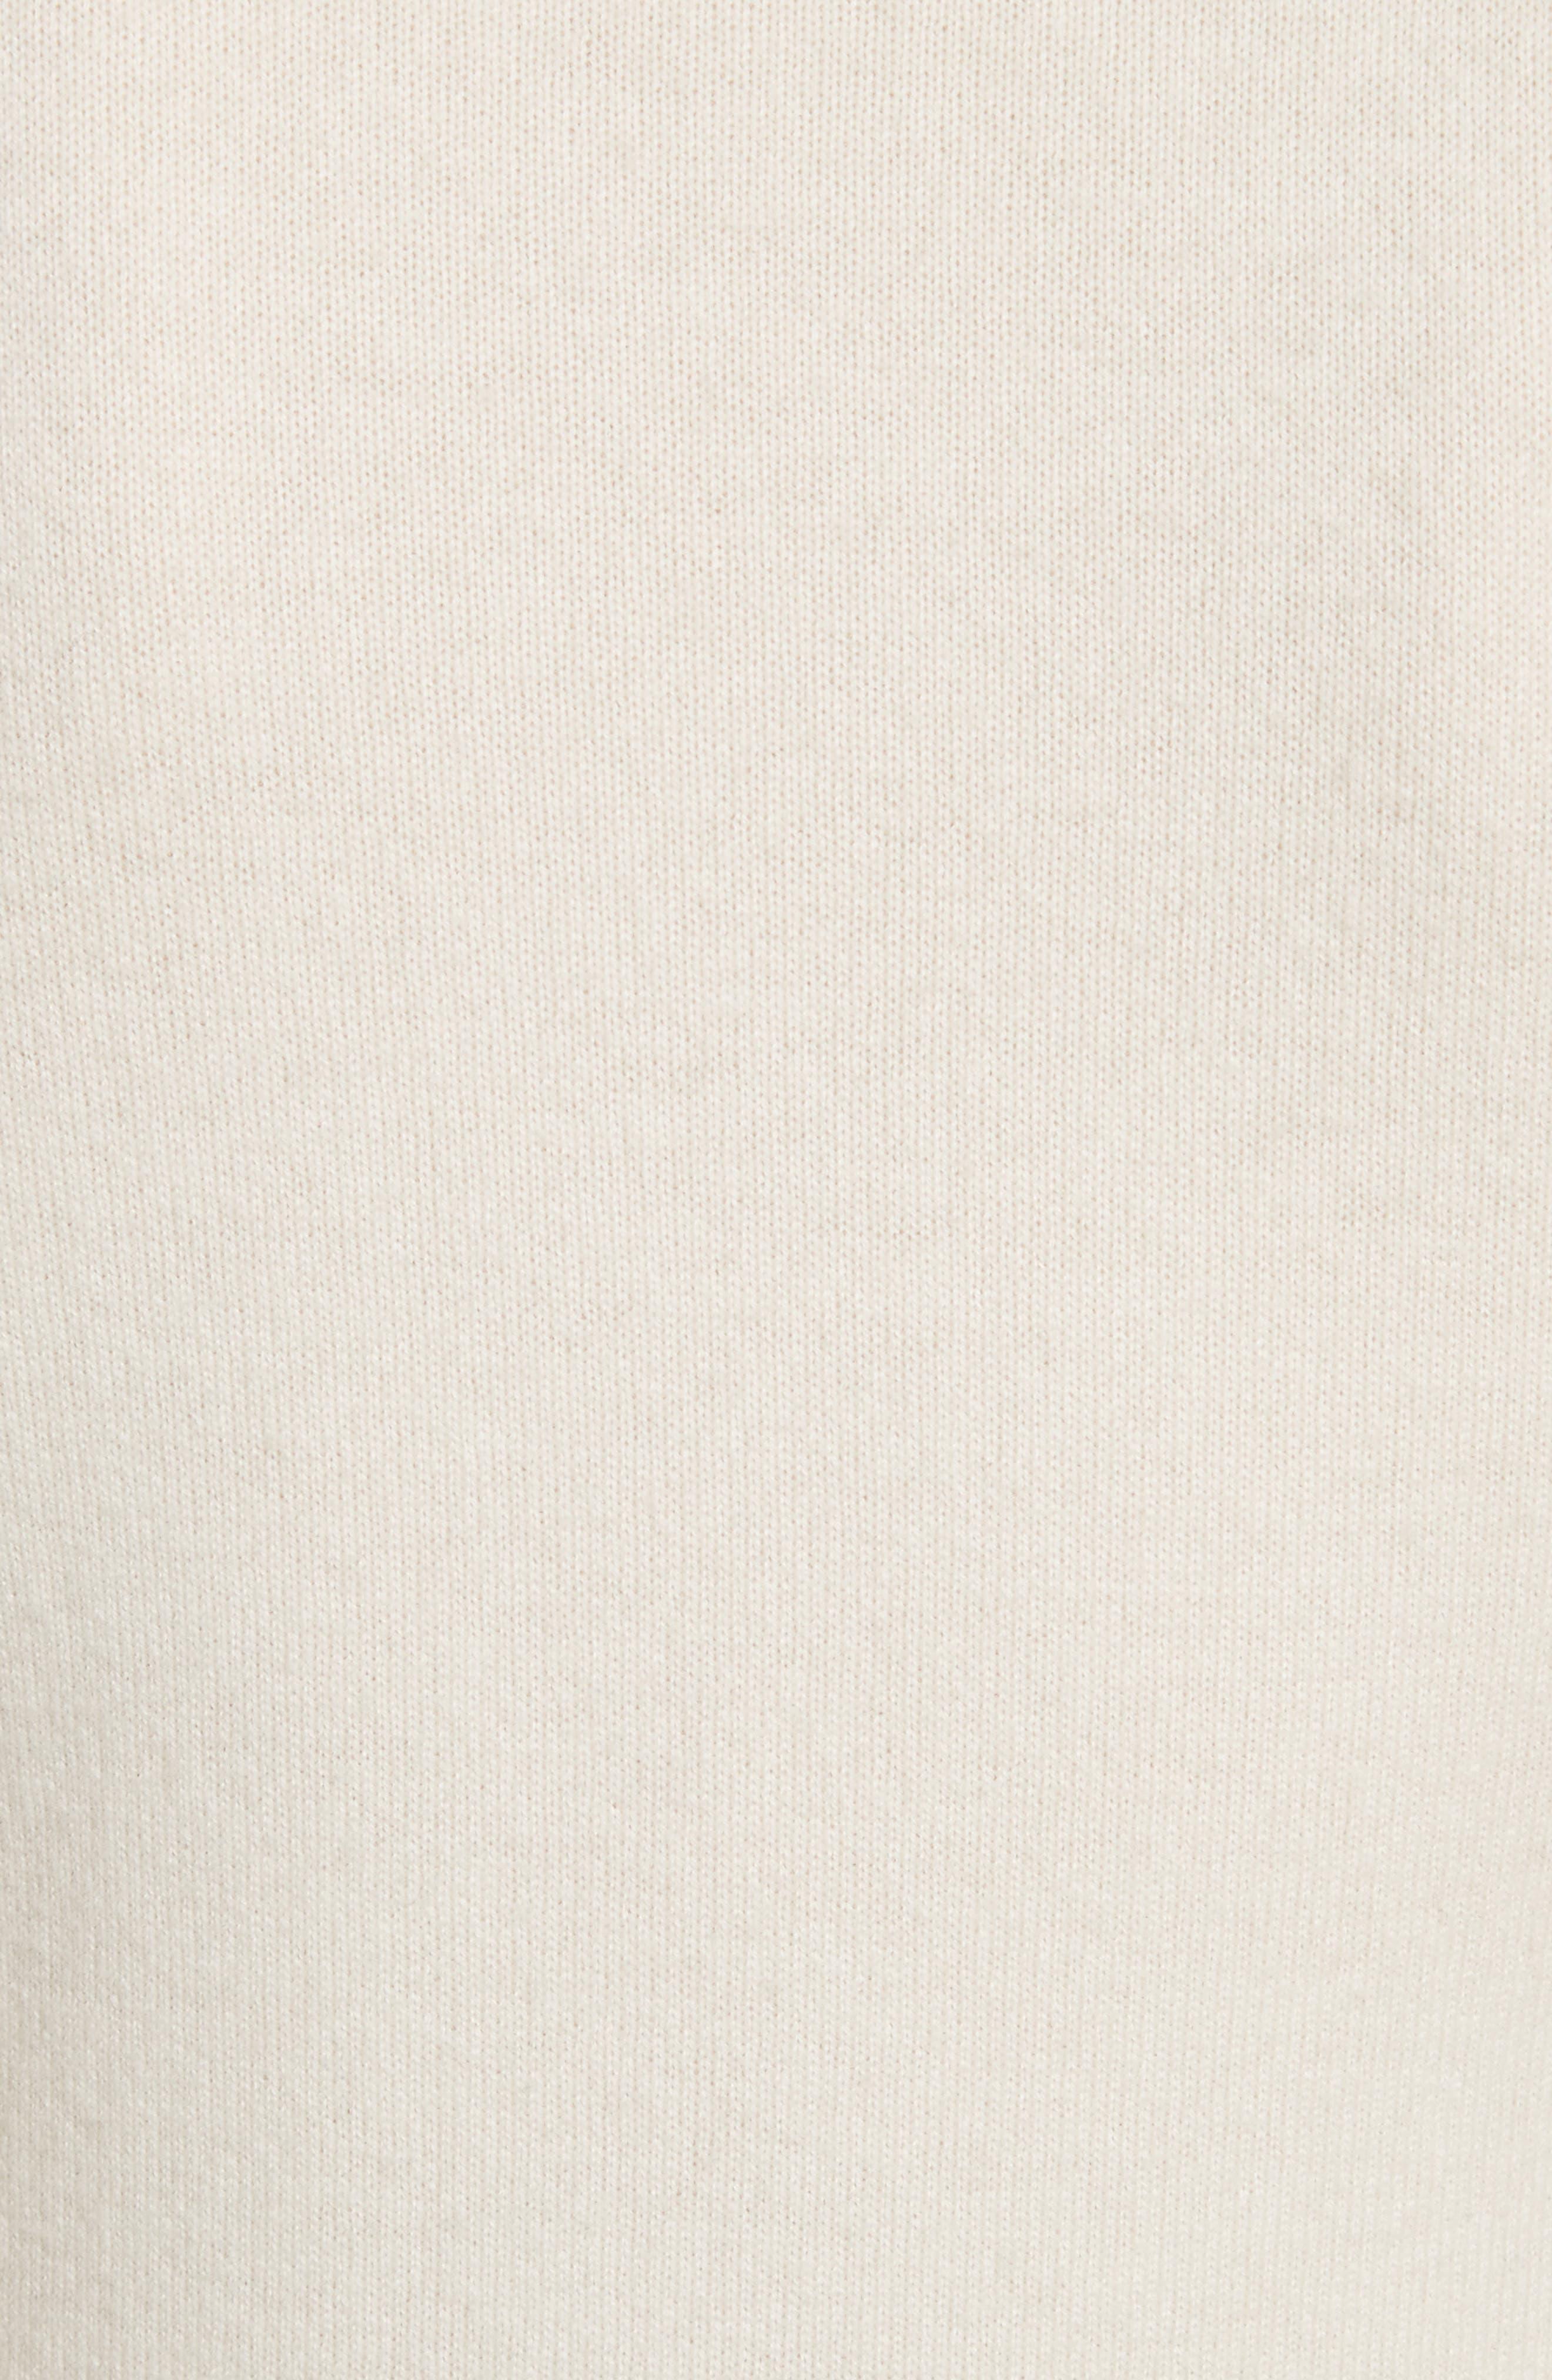 Cashmere Turtleneck Shell,                             Alternate thumbnail 7, color,                             Ivory